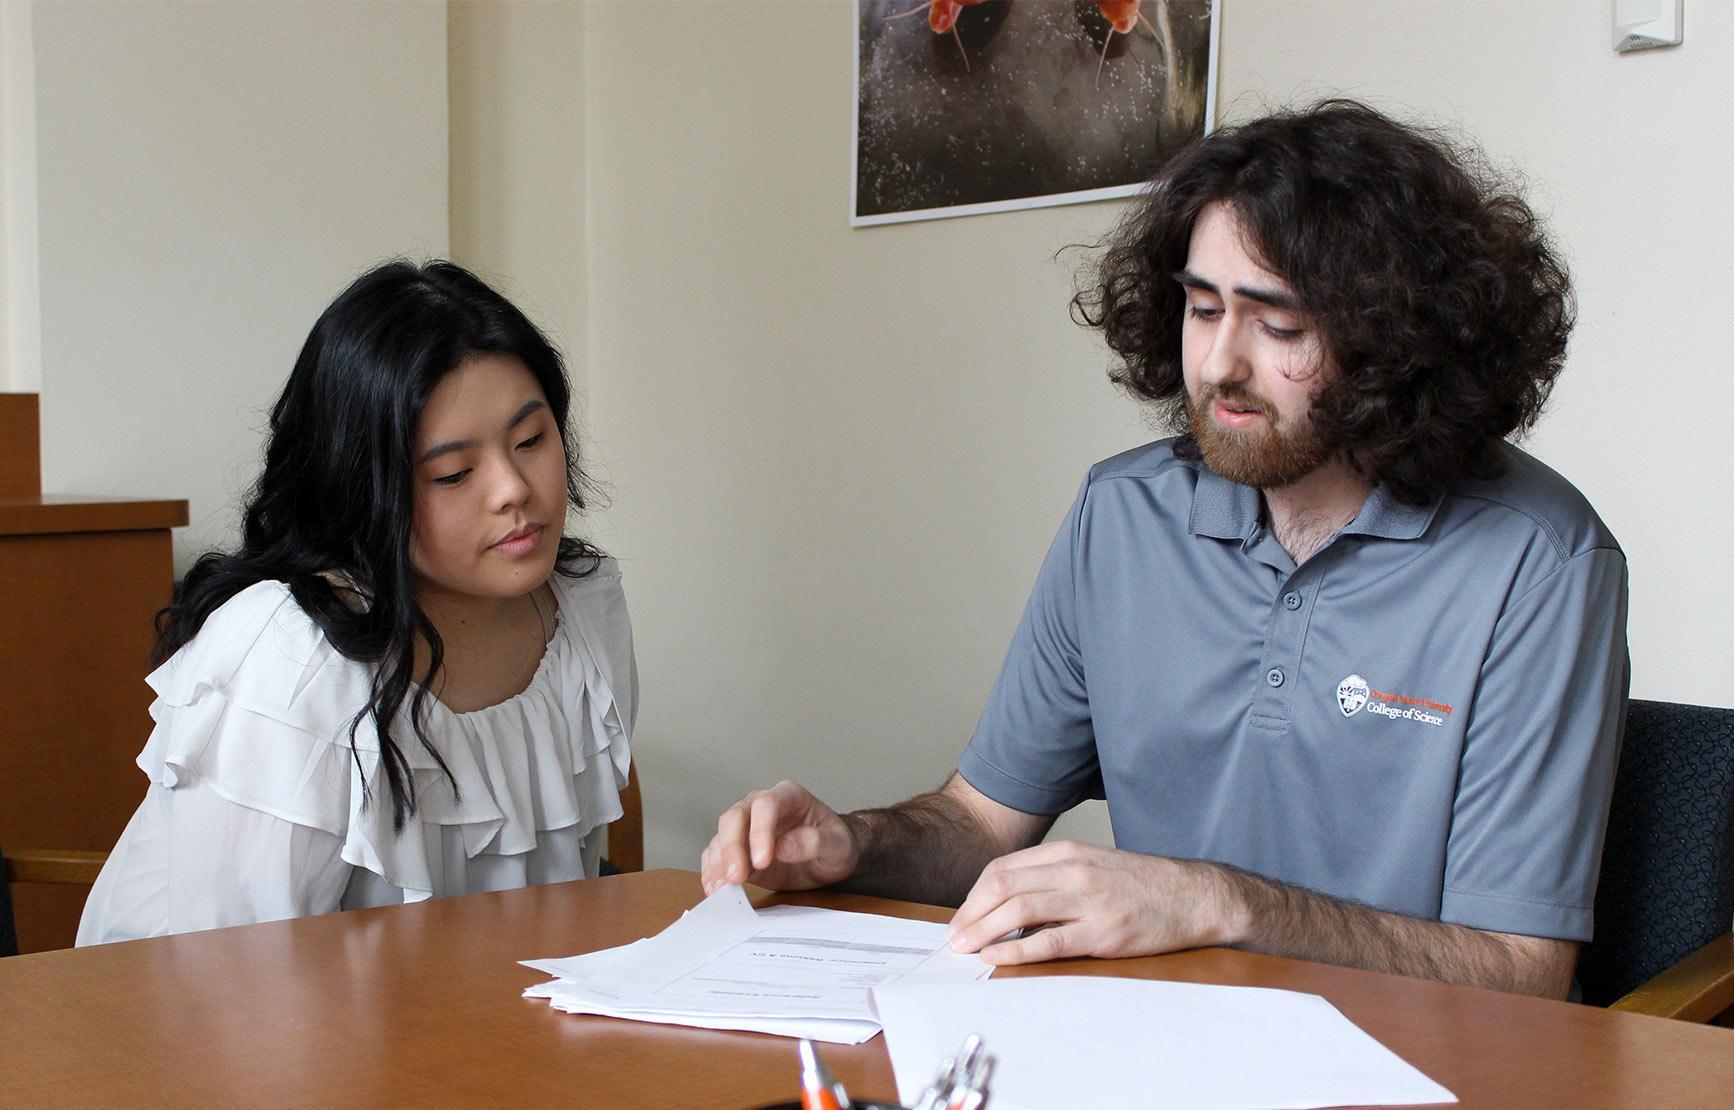 Steve Dobrioglio tutoring a female student in conference room